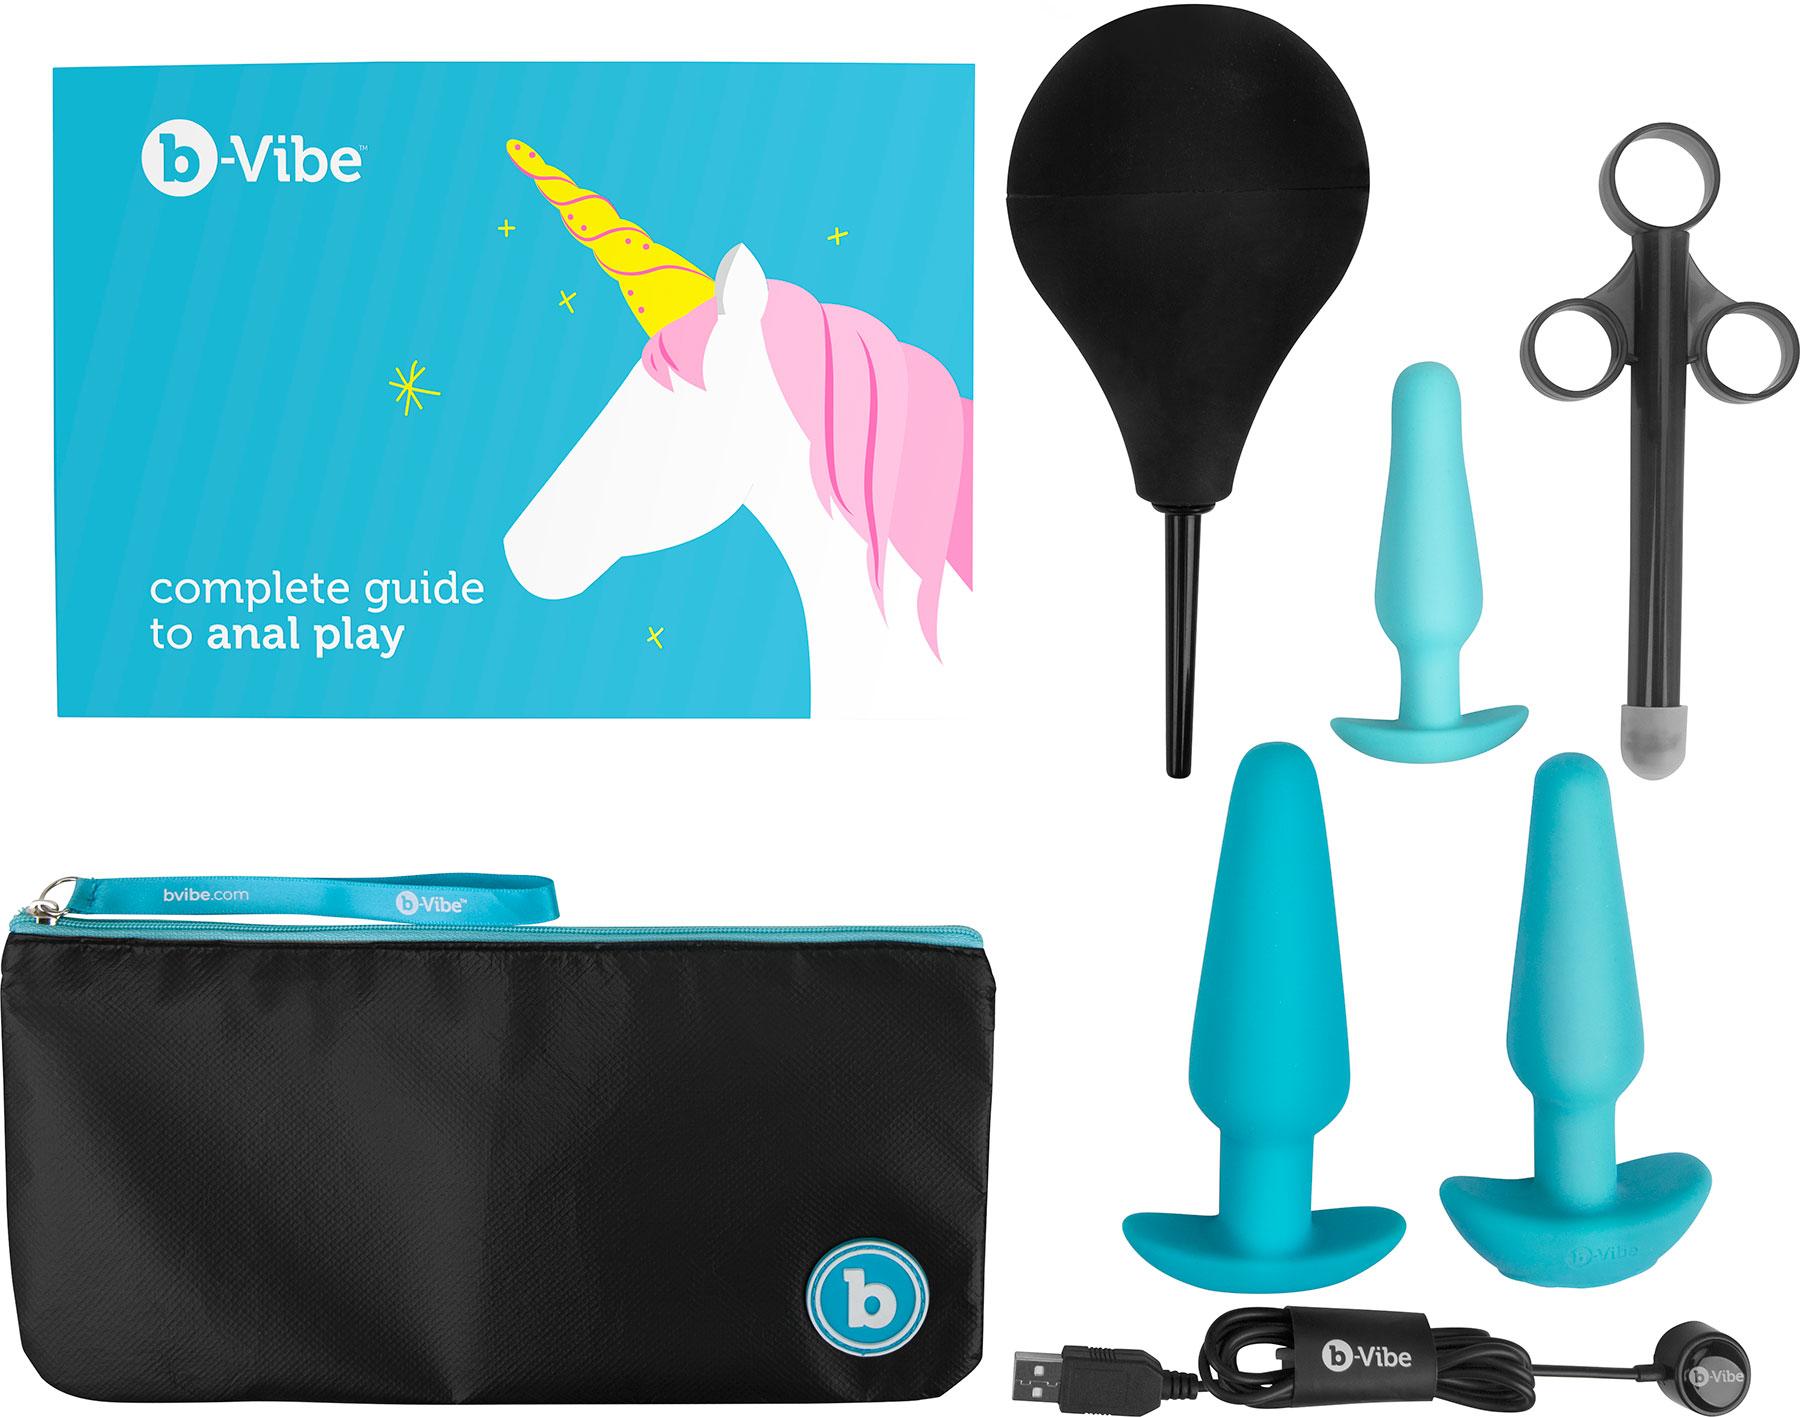 b-Vibe Anal Training & Education Set - Ce include setul